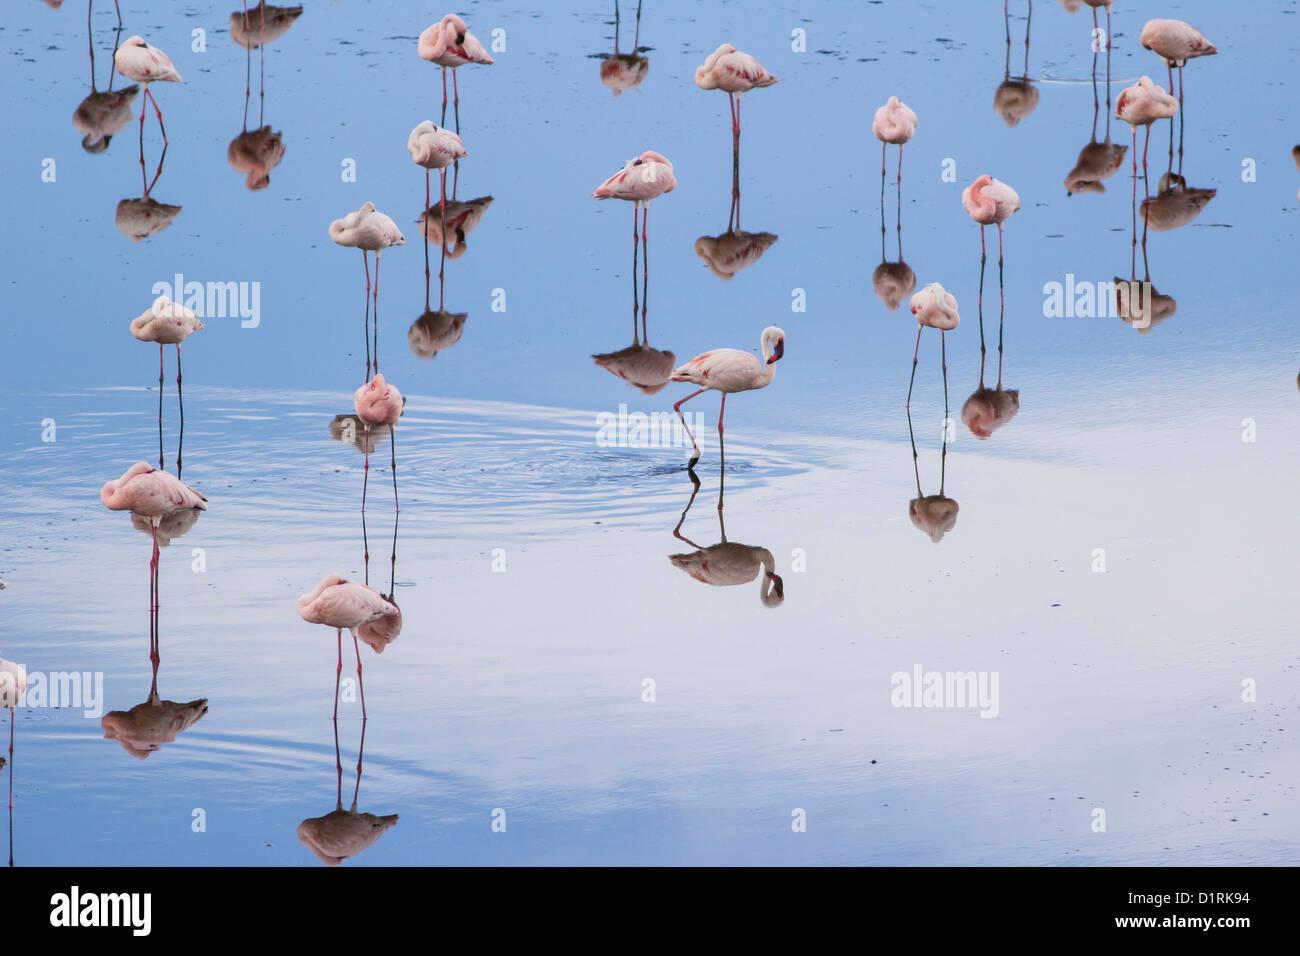 Flamingo in Arusha National Park. Safari in Tanzania Africa - Stock Image